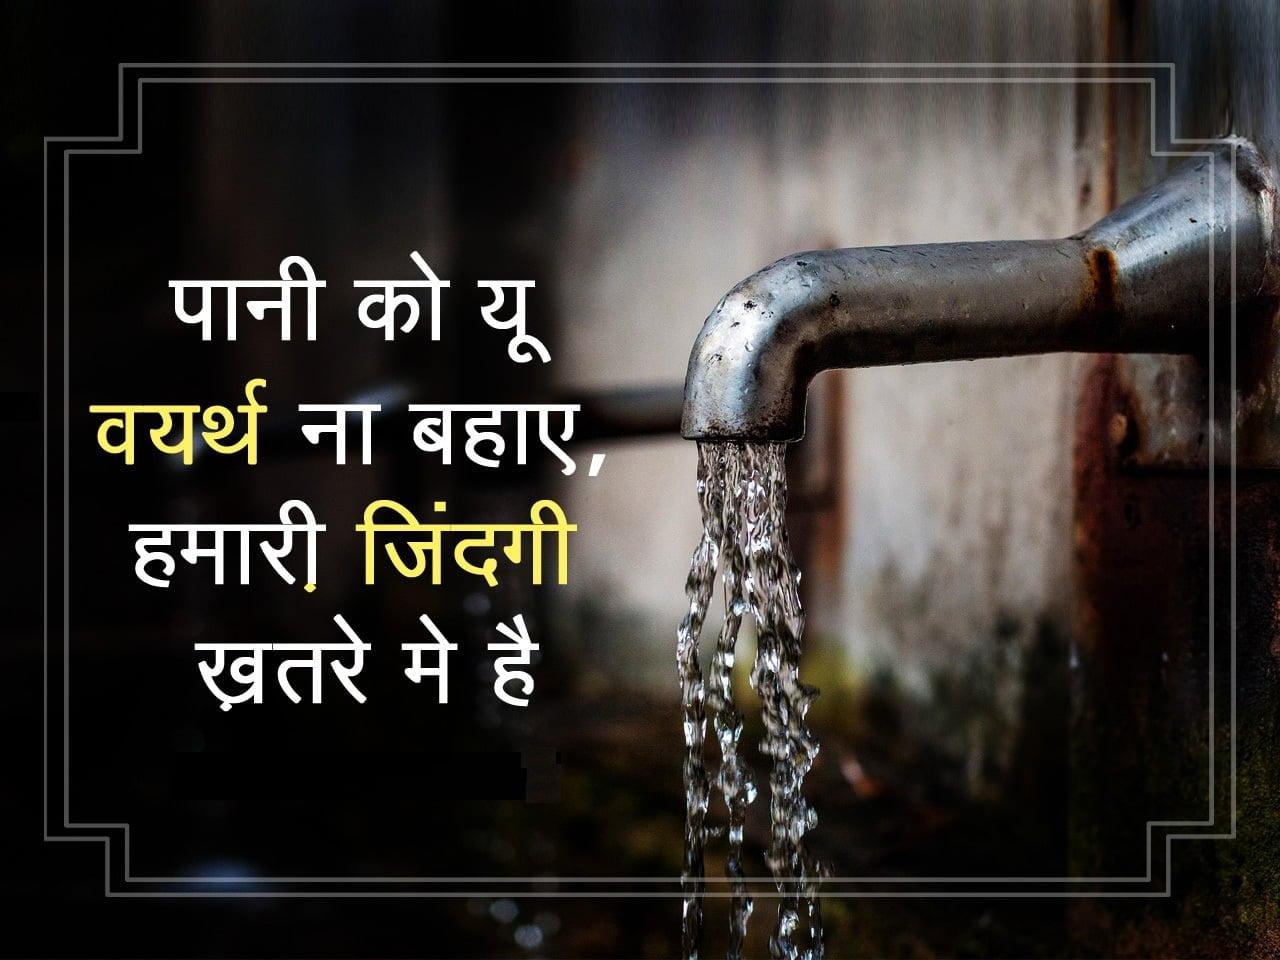 जल संरक्षण पर नारे - Save Water Slogans In Hindi